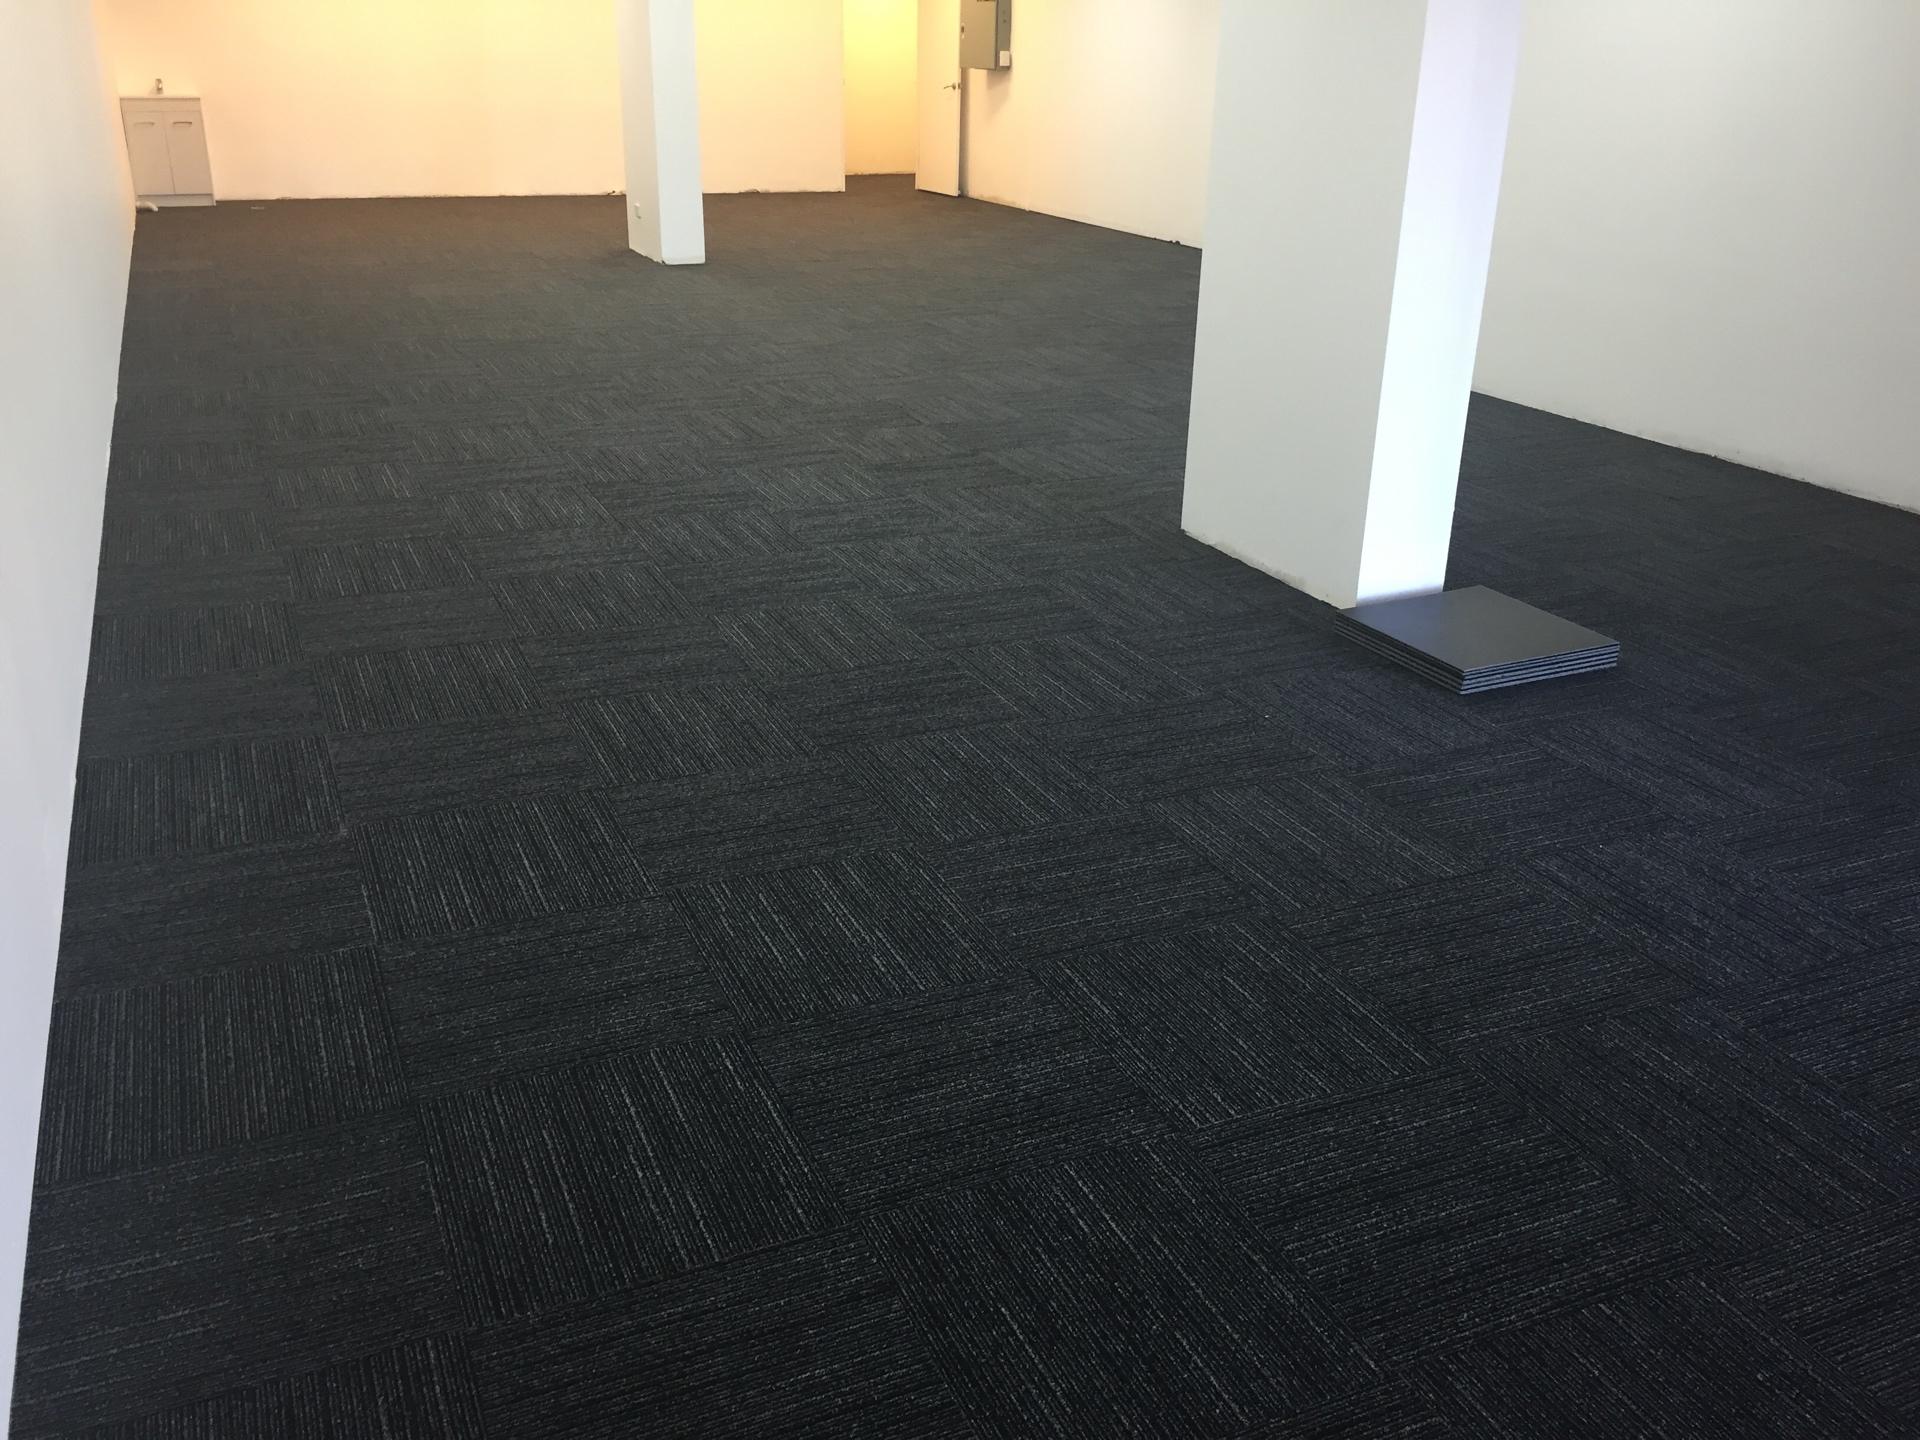 Laying carpet tiles on concrete floor